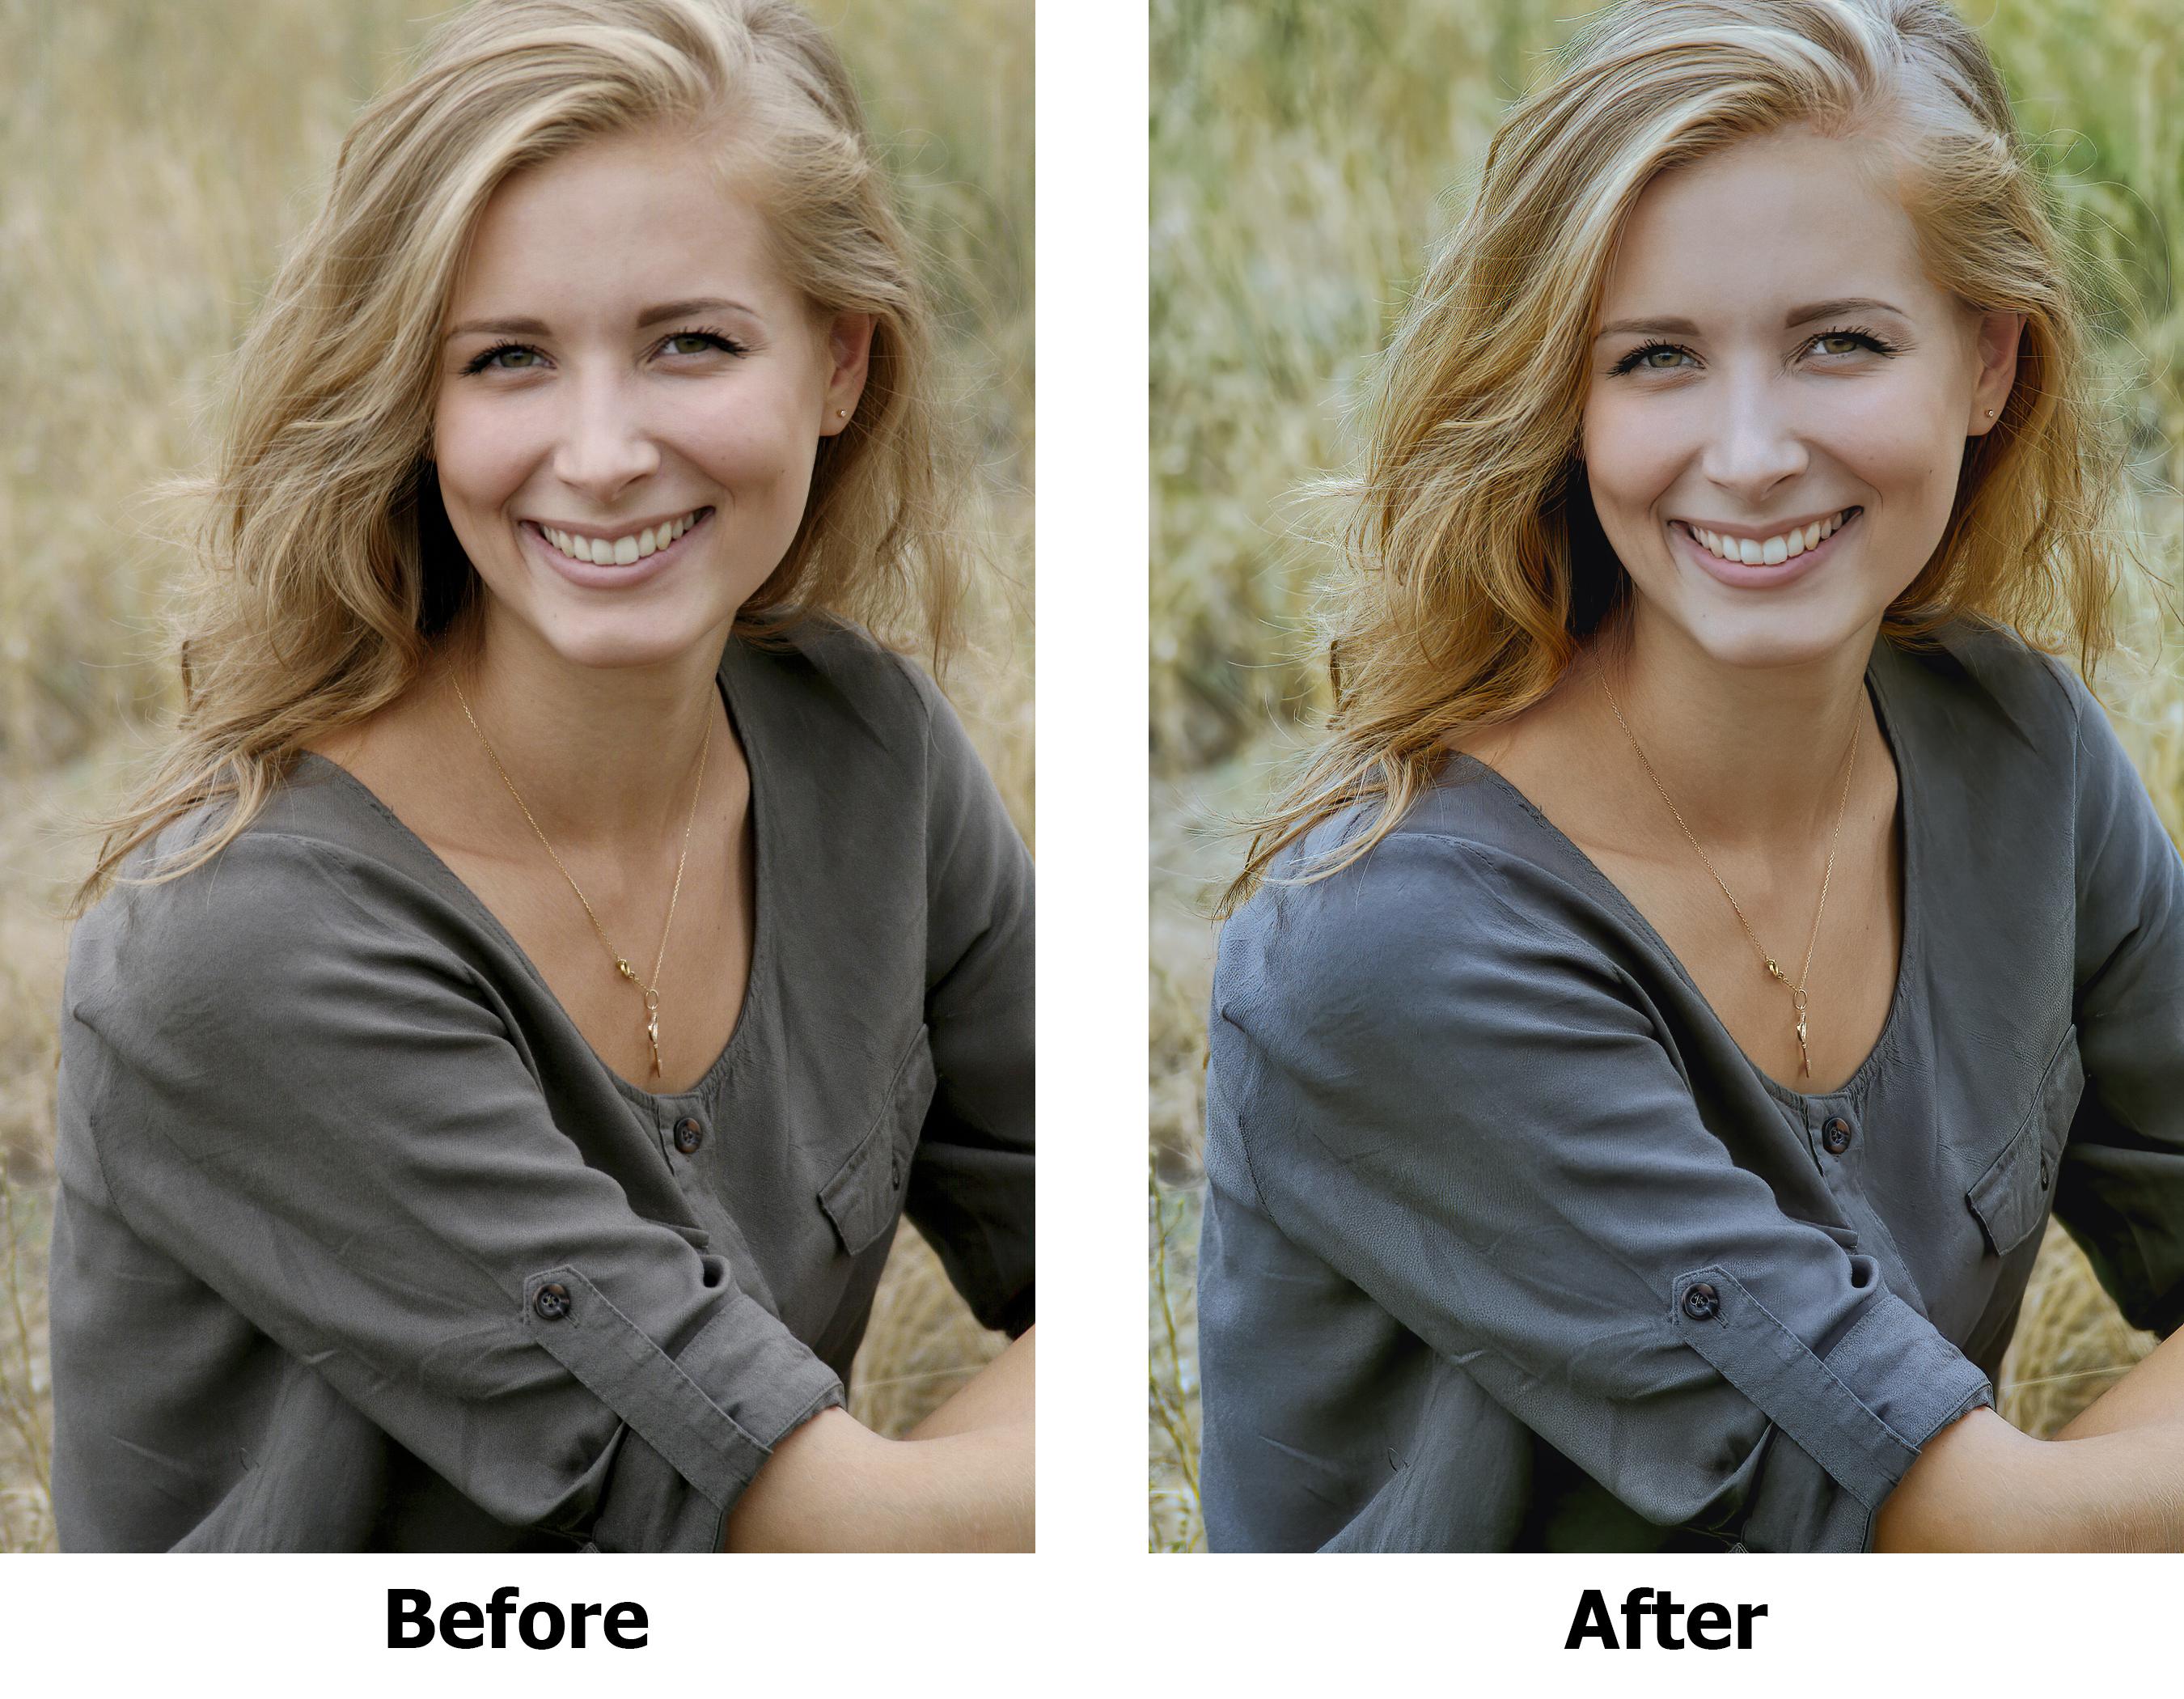 girl-before-after-v2.jpg